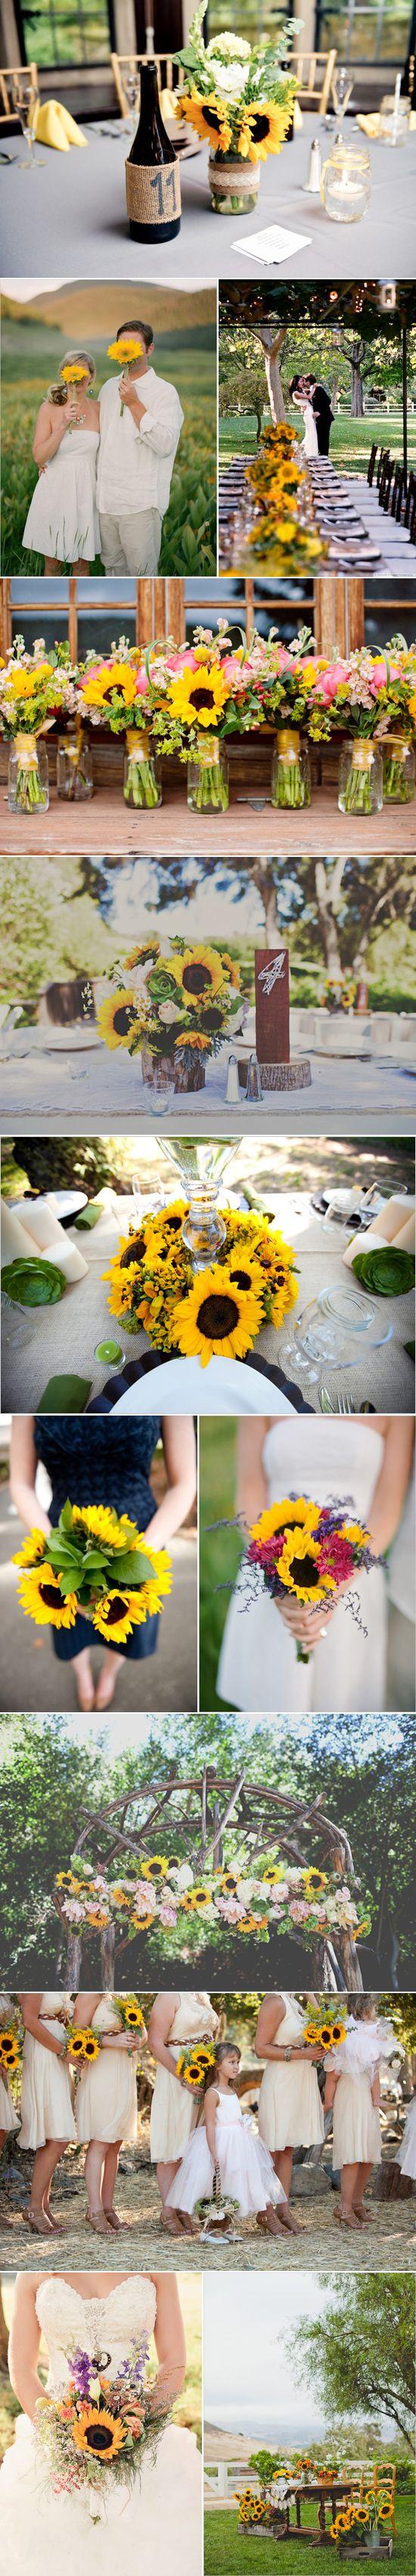 sunflower wedding invitations printable%0A Sunflower Wedding Inspiration